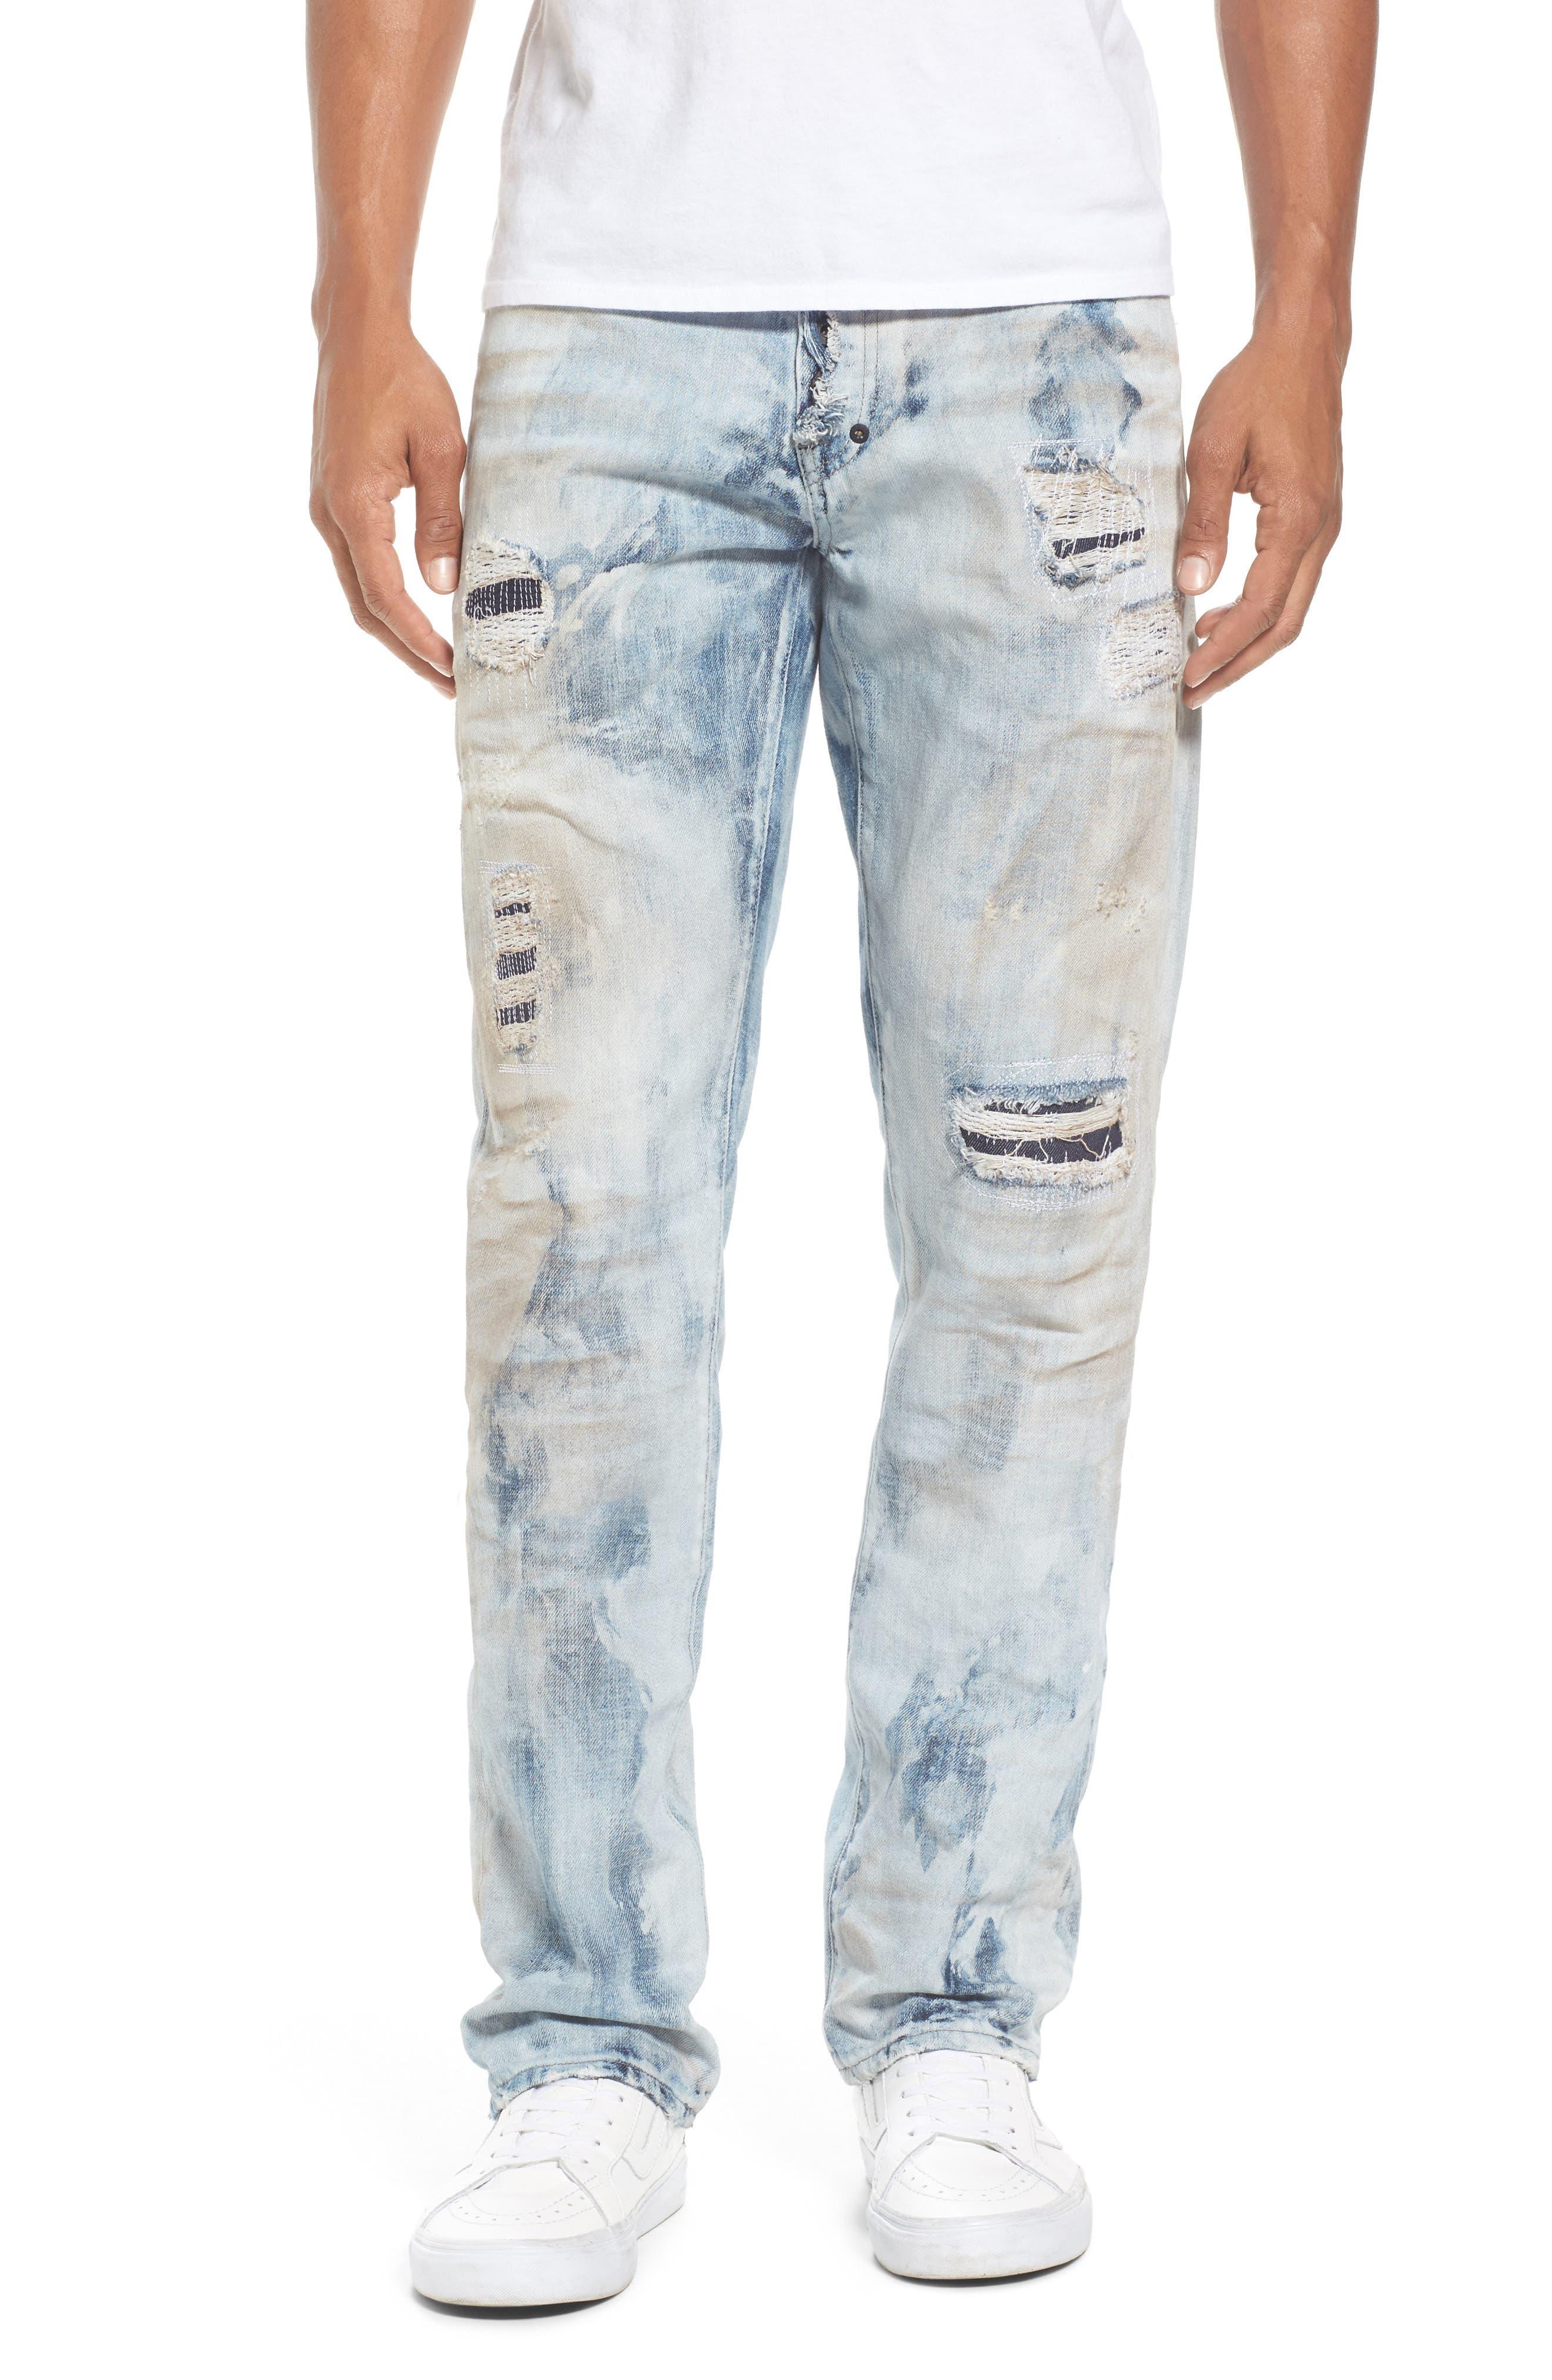 Demon Slim Straight Leg Jeans,                         Main,                         color, COZY LIGHT WASH